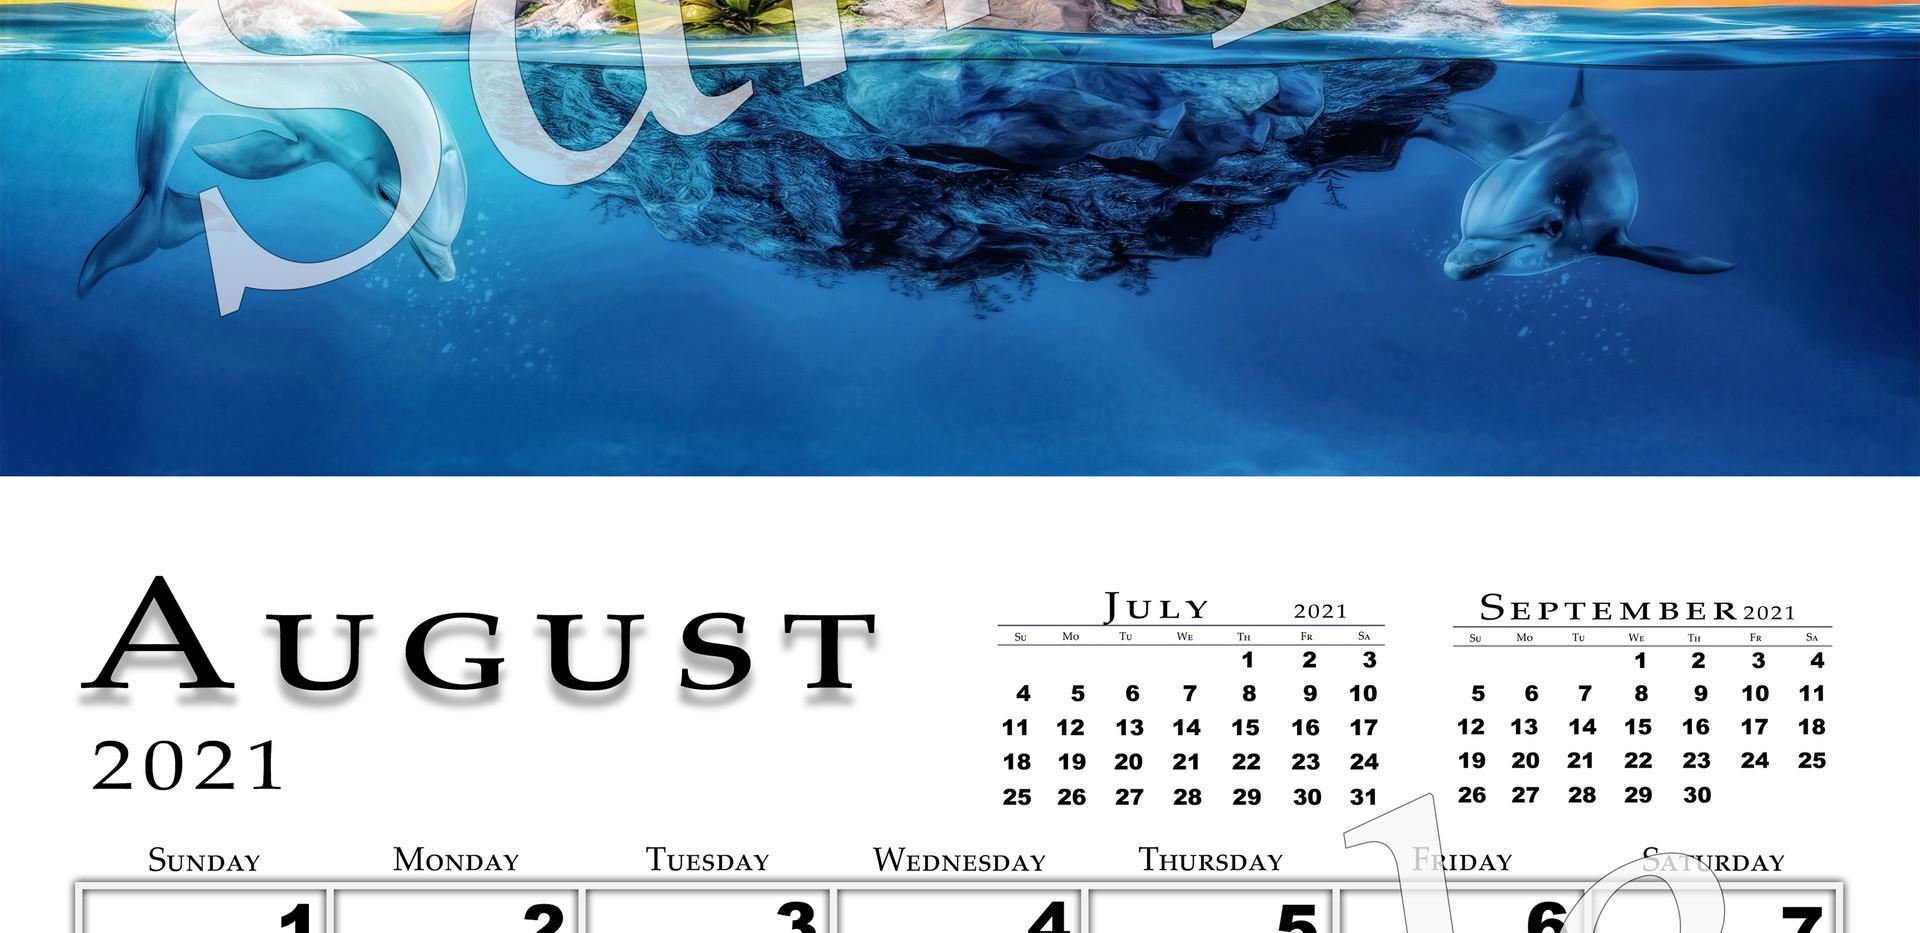 August 2021 Full Page Sample.jpg